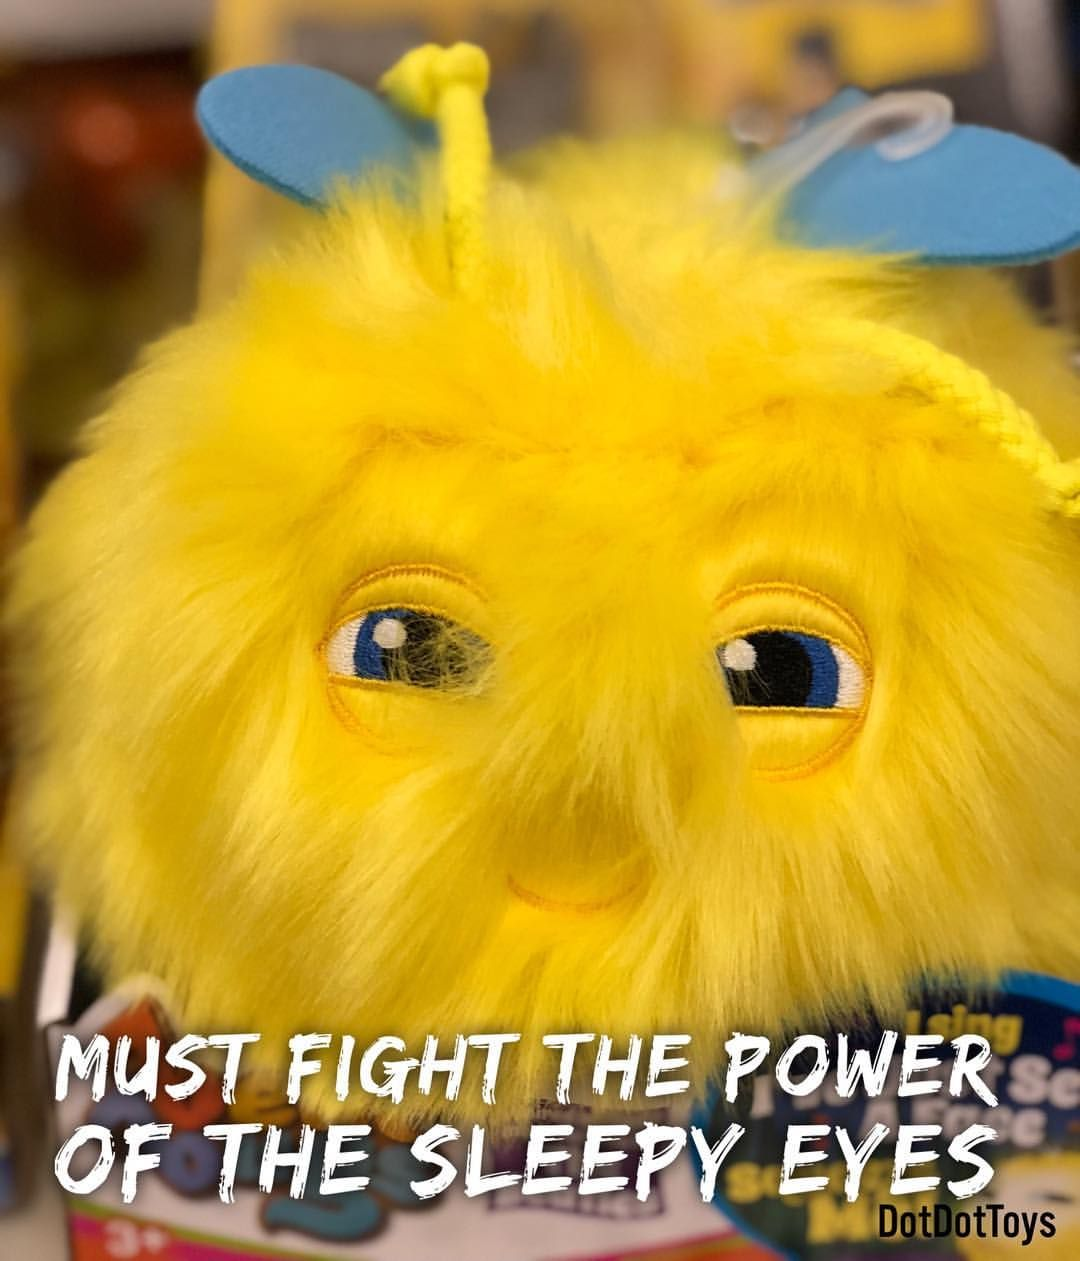 Kid Friendly Memes Funny Memes That Kids Will Love Memes For Children Kid Friendly Memes Wholesome Memes Funny Memes